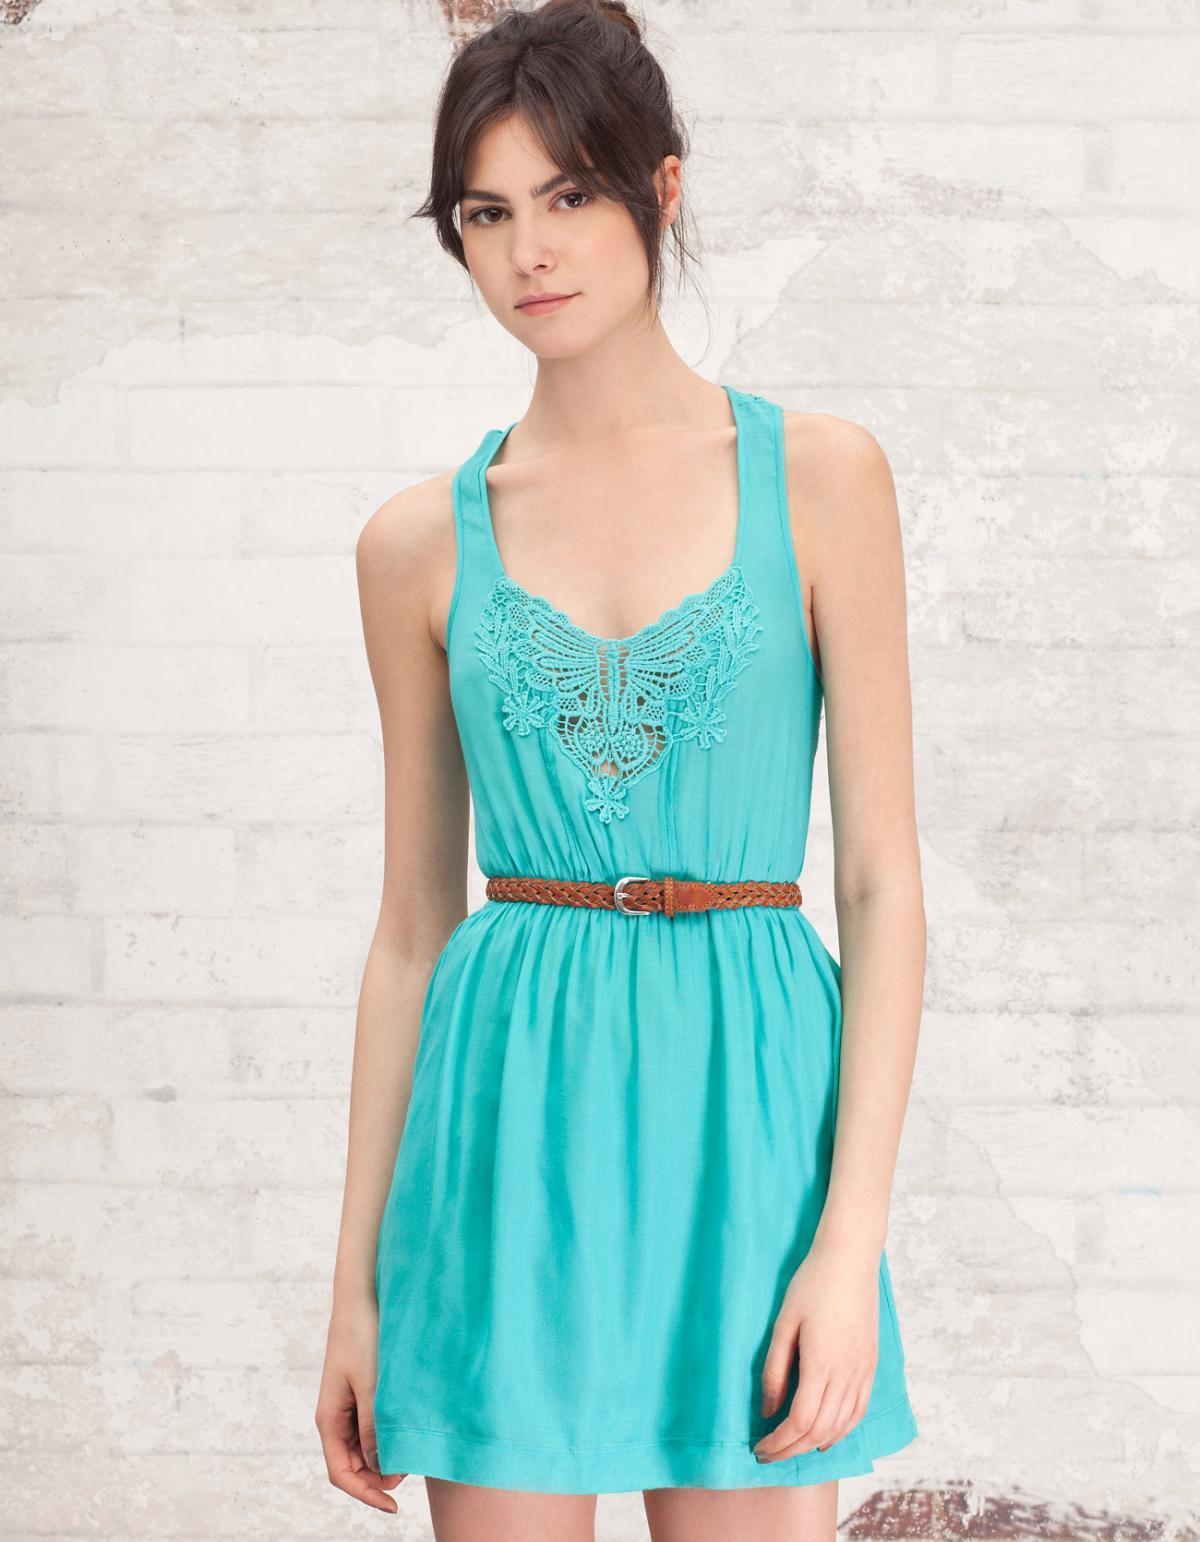 turkusowa sukienka Stradivarius - lato 2012